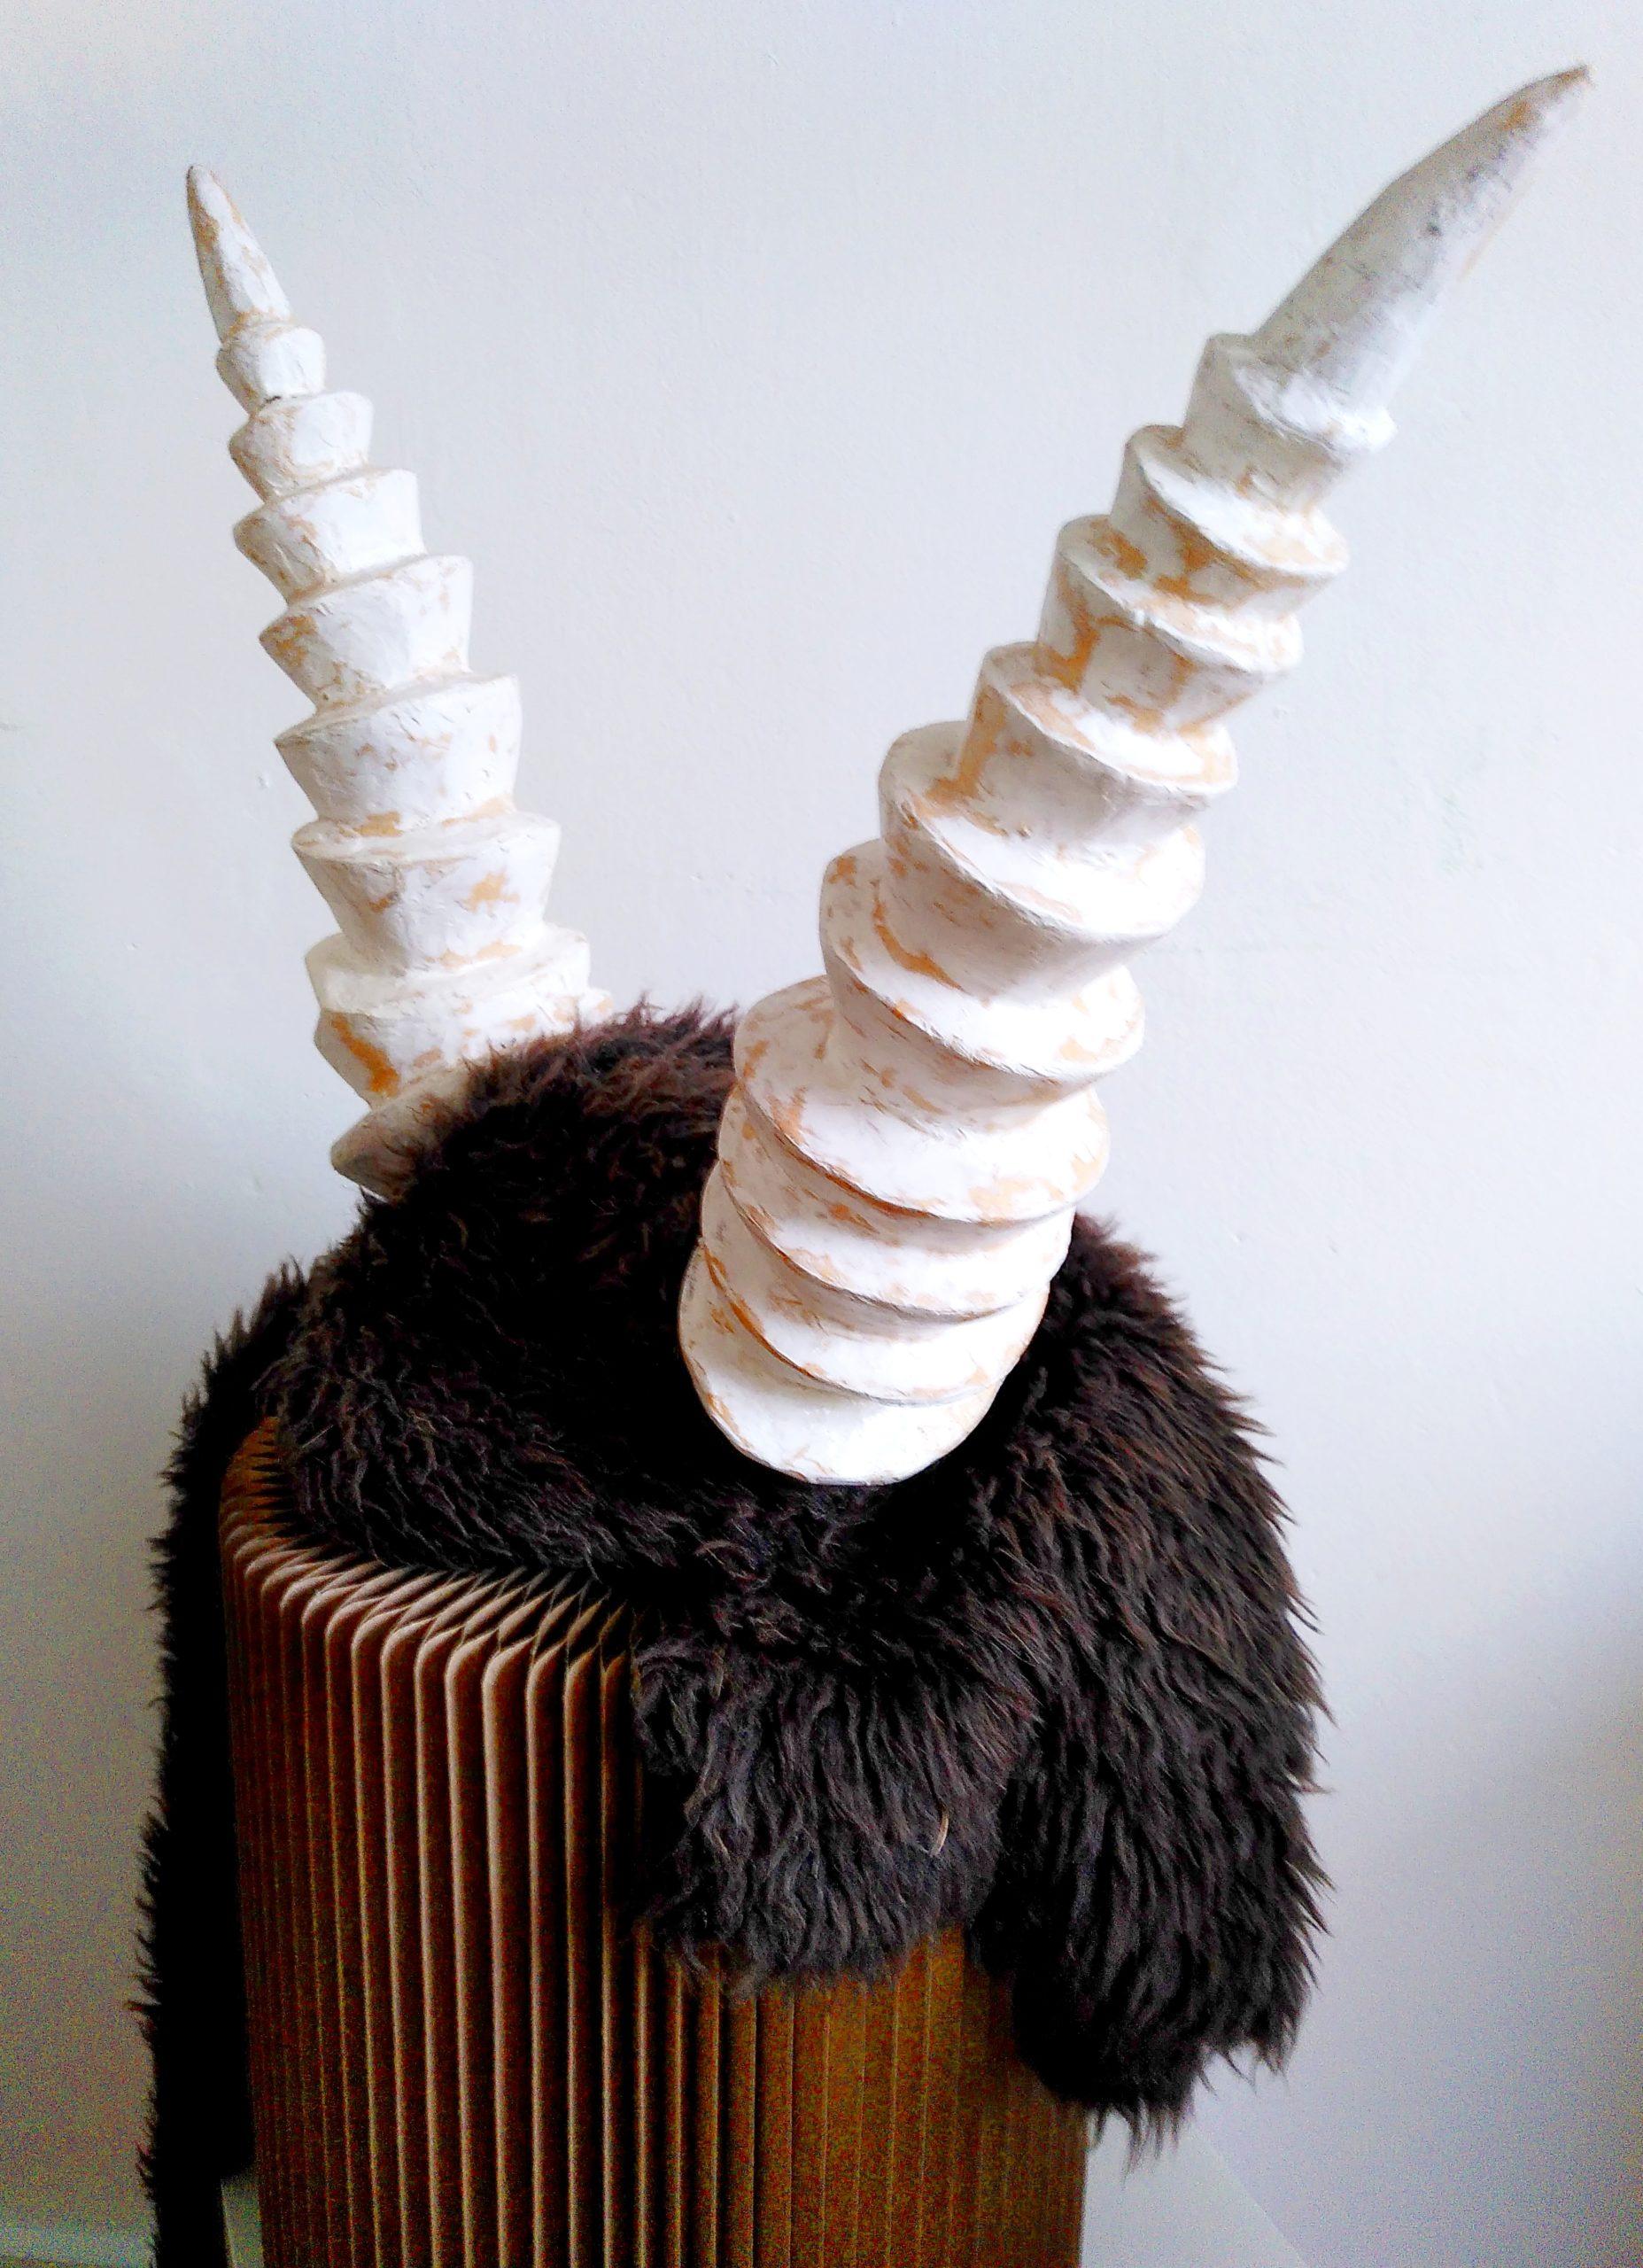 Minotaur headwear